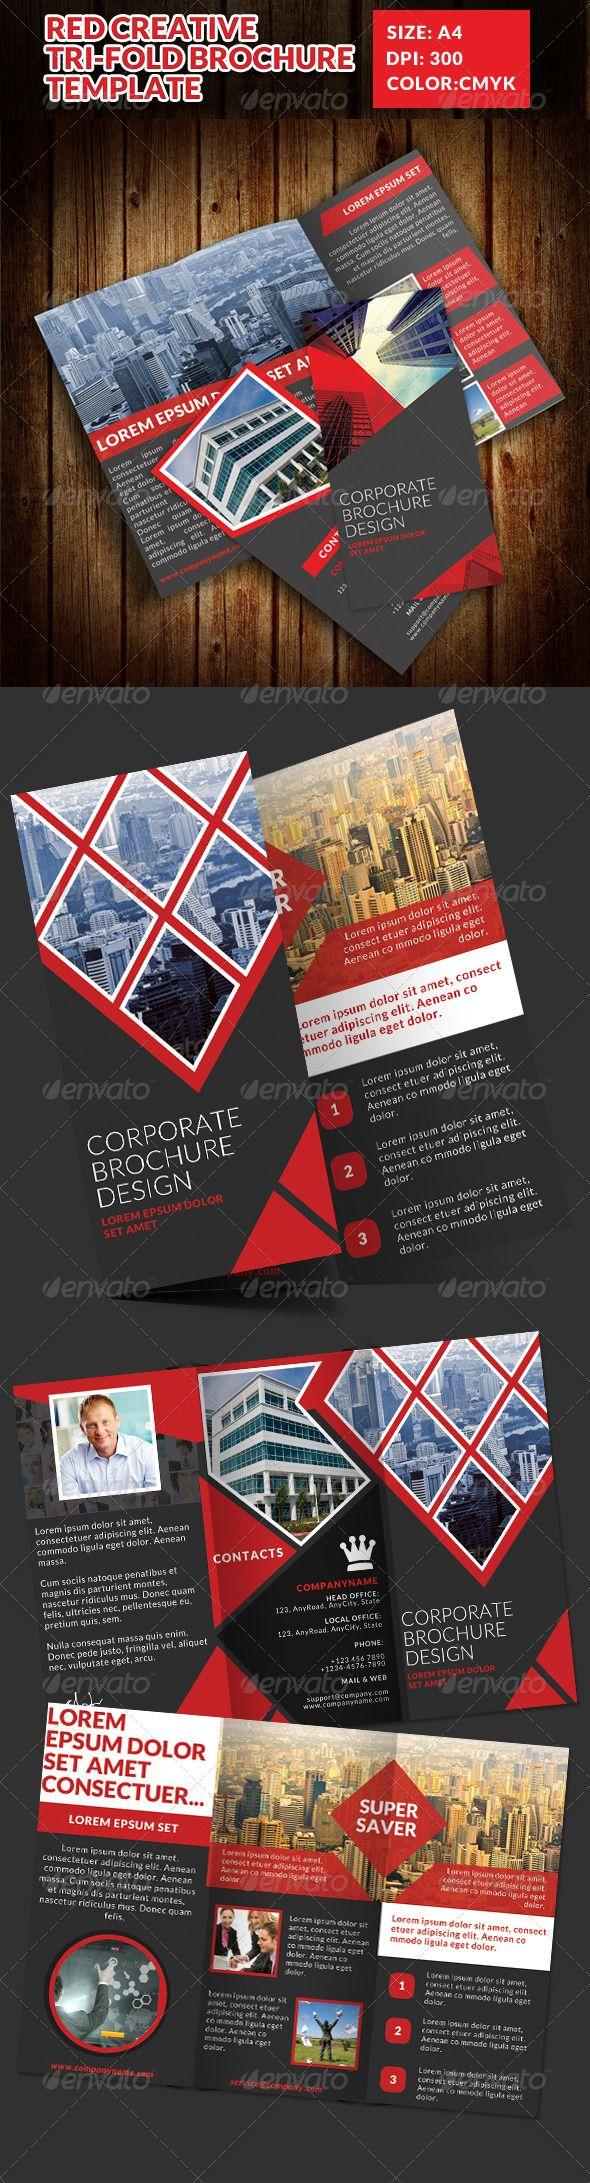 Red Creative Tri-Fold Brochure Templa